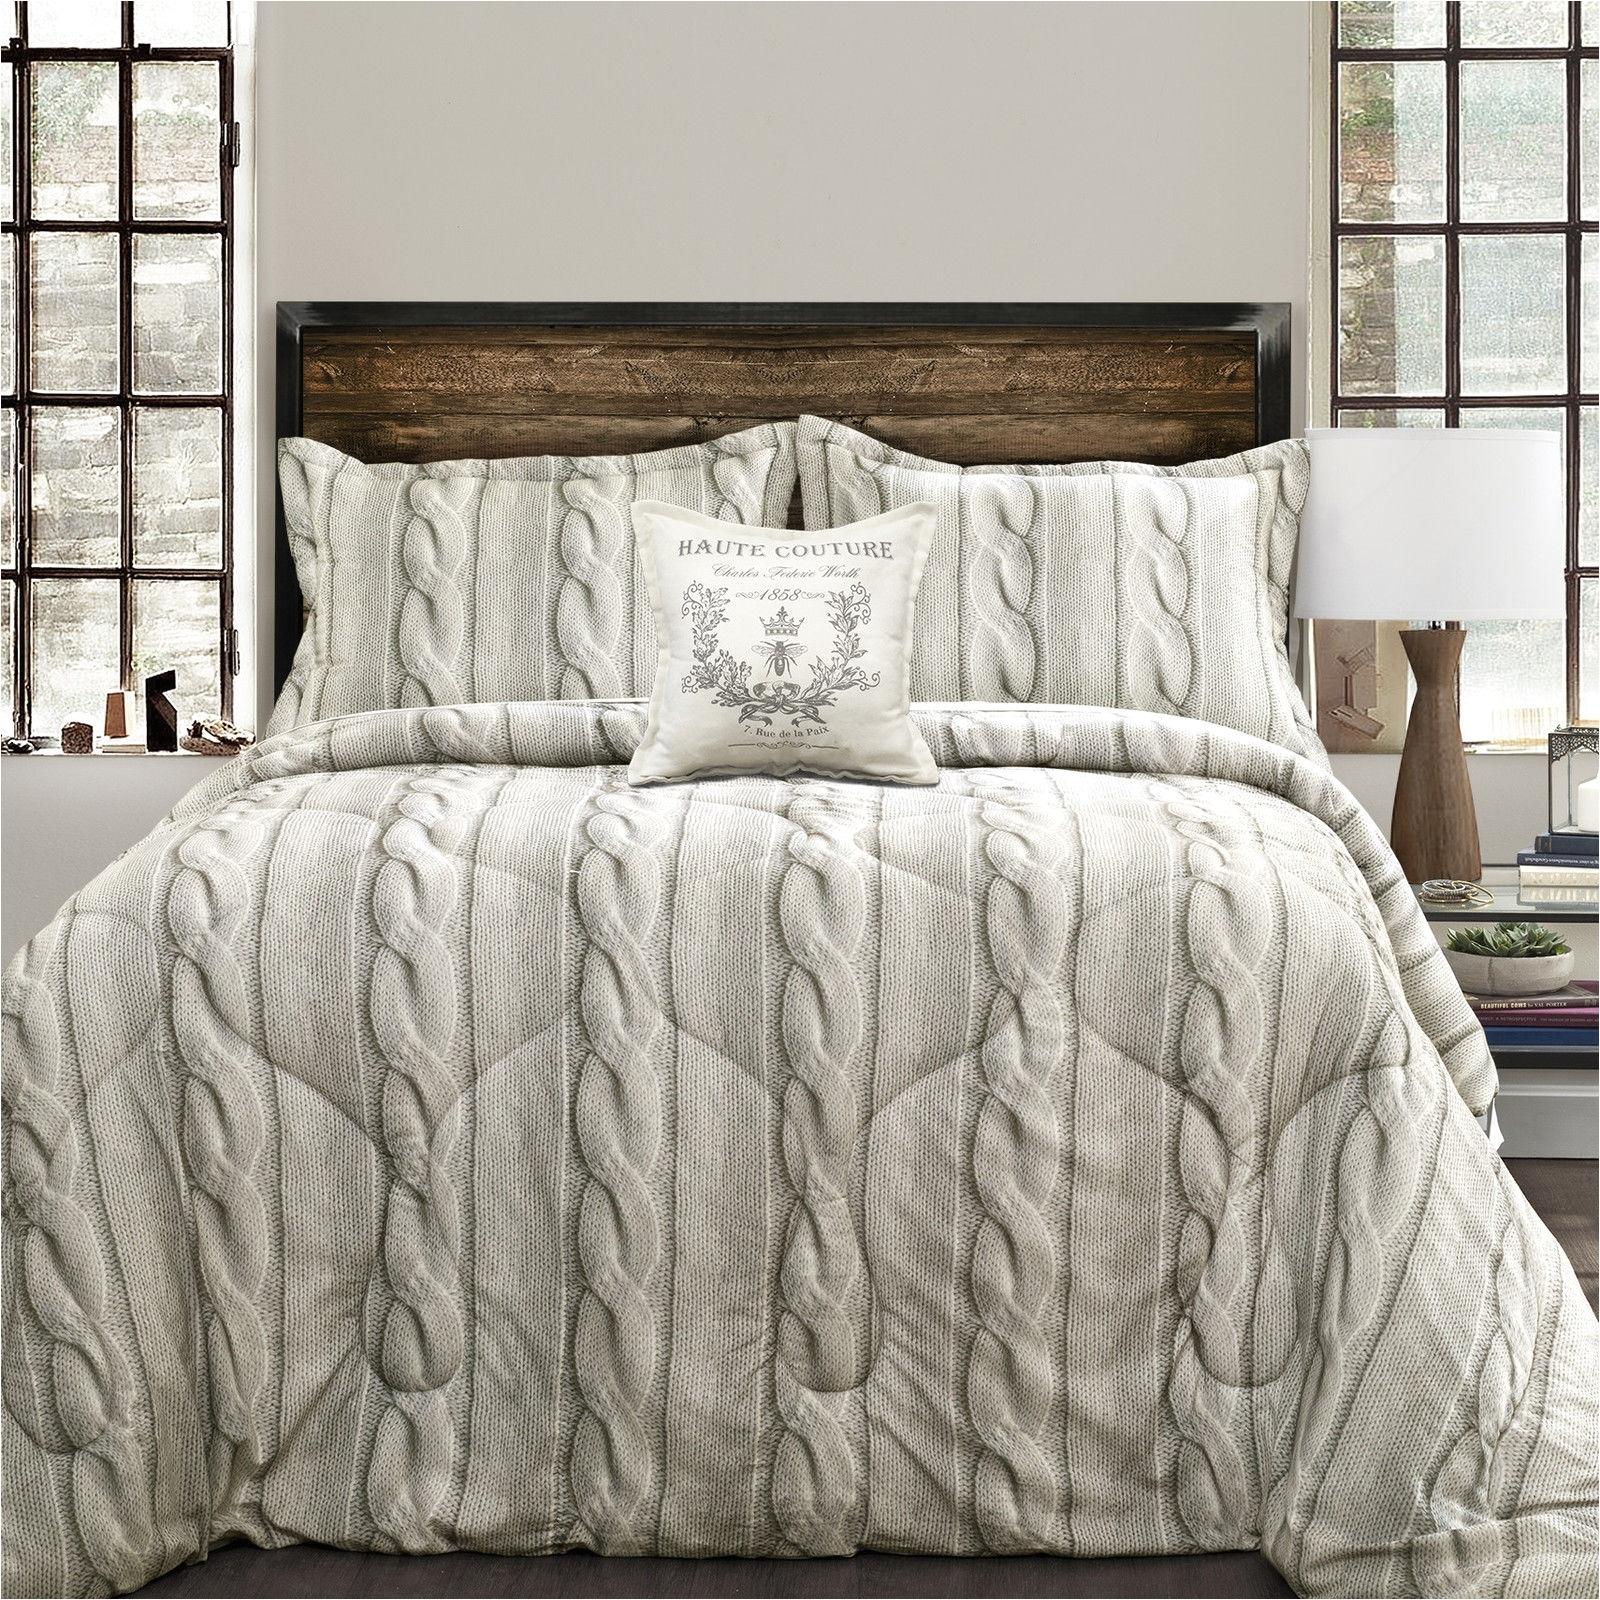 lush decor belle 4 piece comforter set best of laurel foundry modern farmhouse edgeworth 4 piece